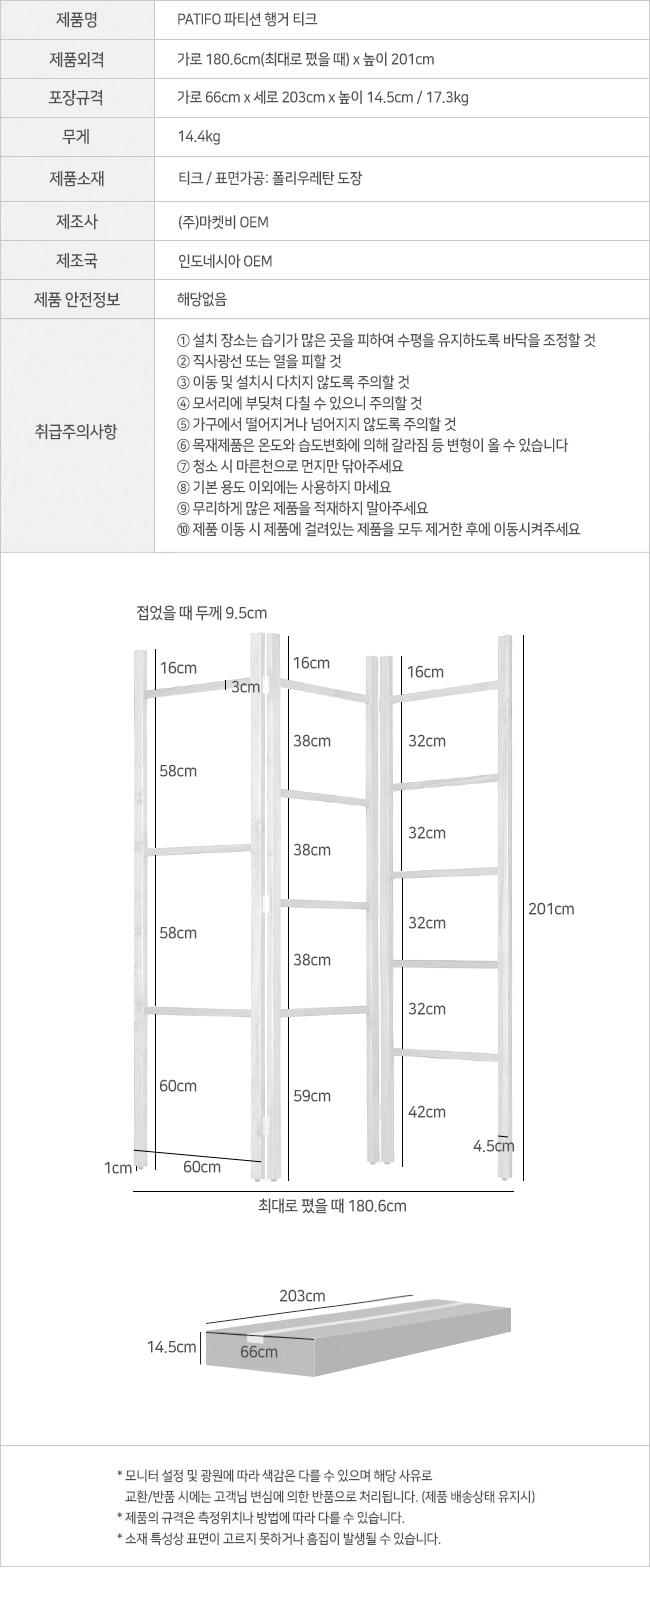 patifo_hanger_info.jpg